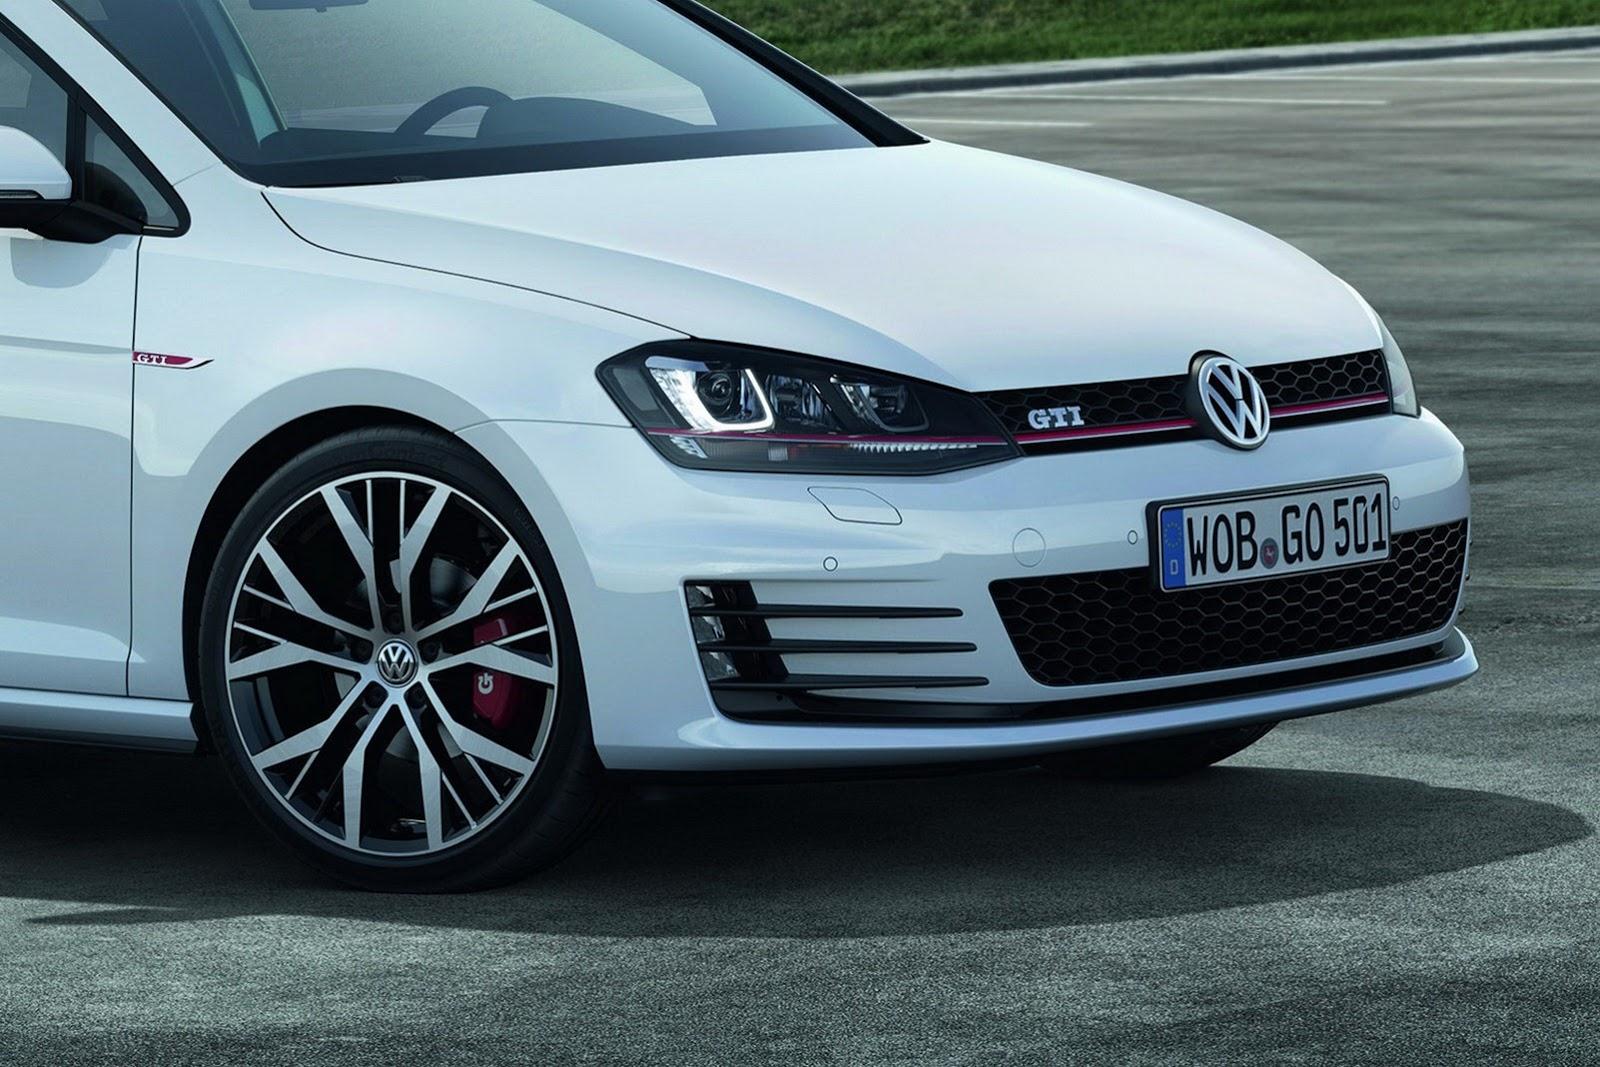 volkswagen cars news 2013 mk golf gti officially revealed. Black Bedroom Furniture Sets. Home Design Ideas